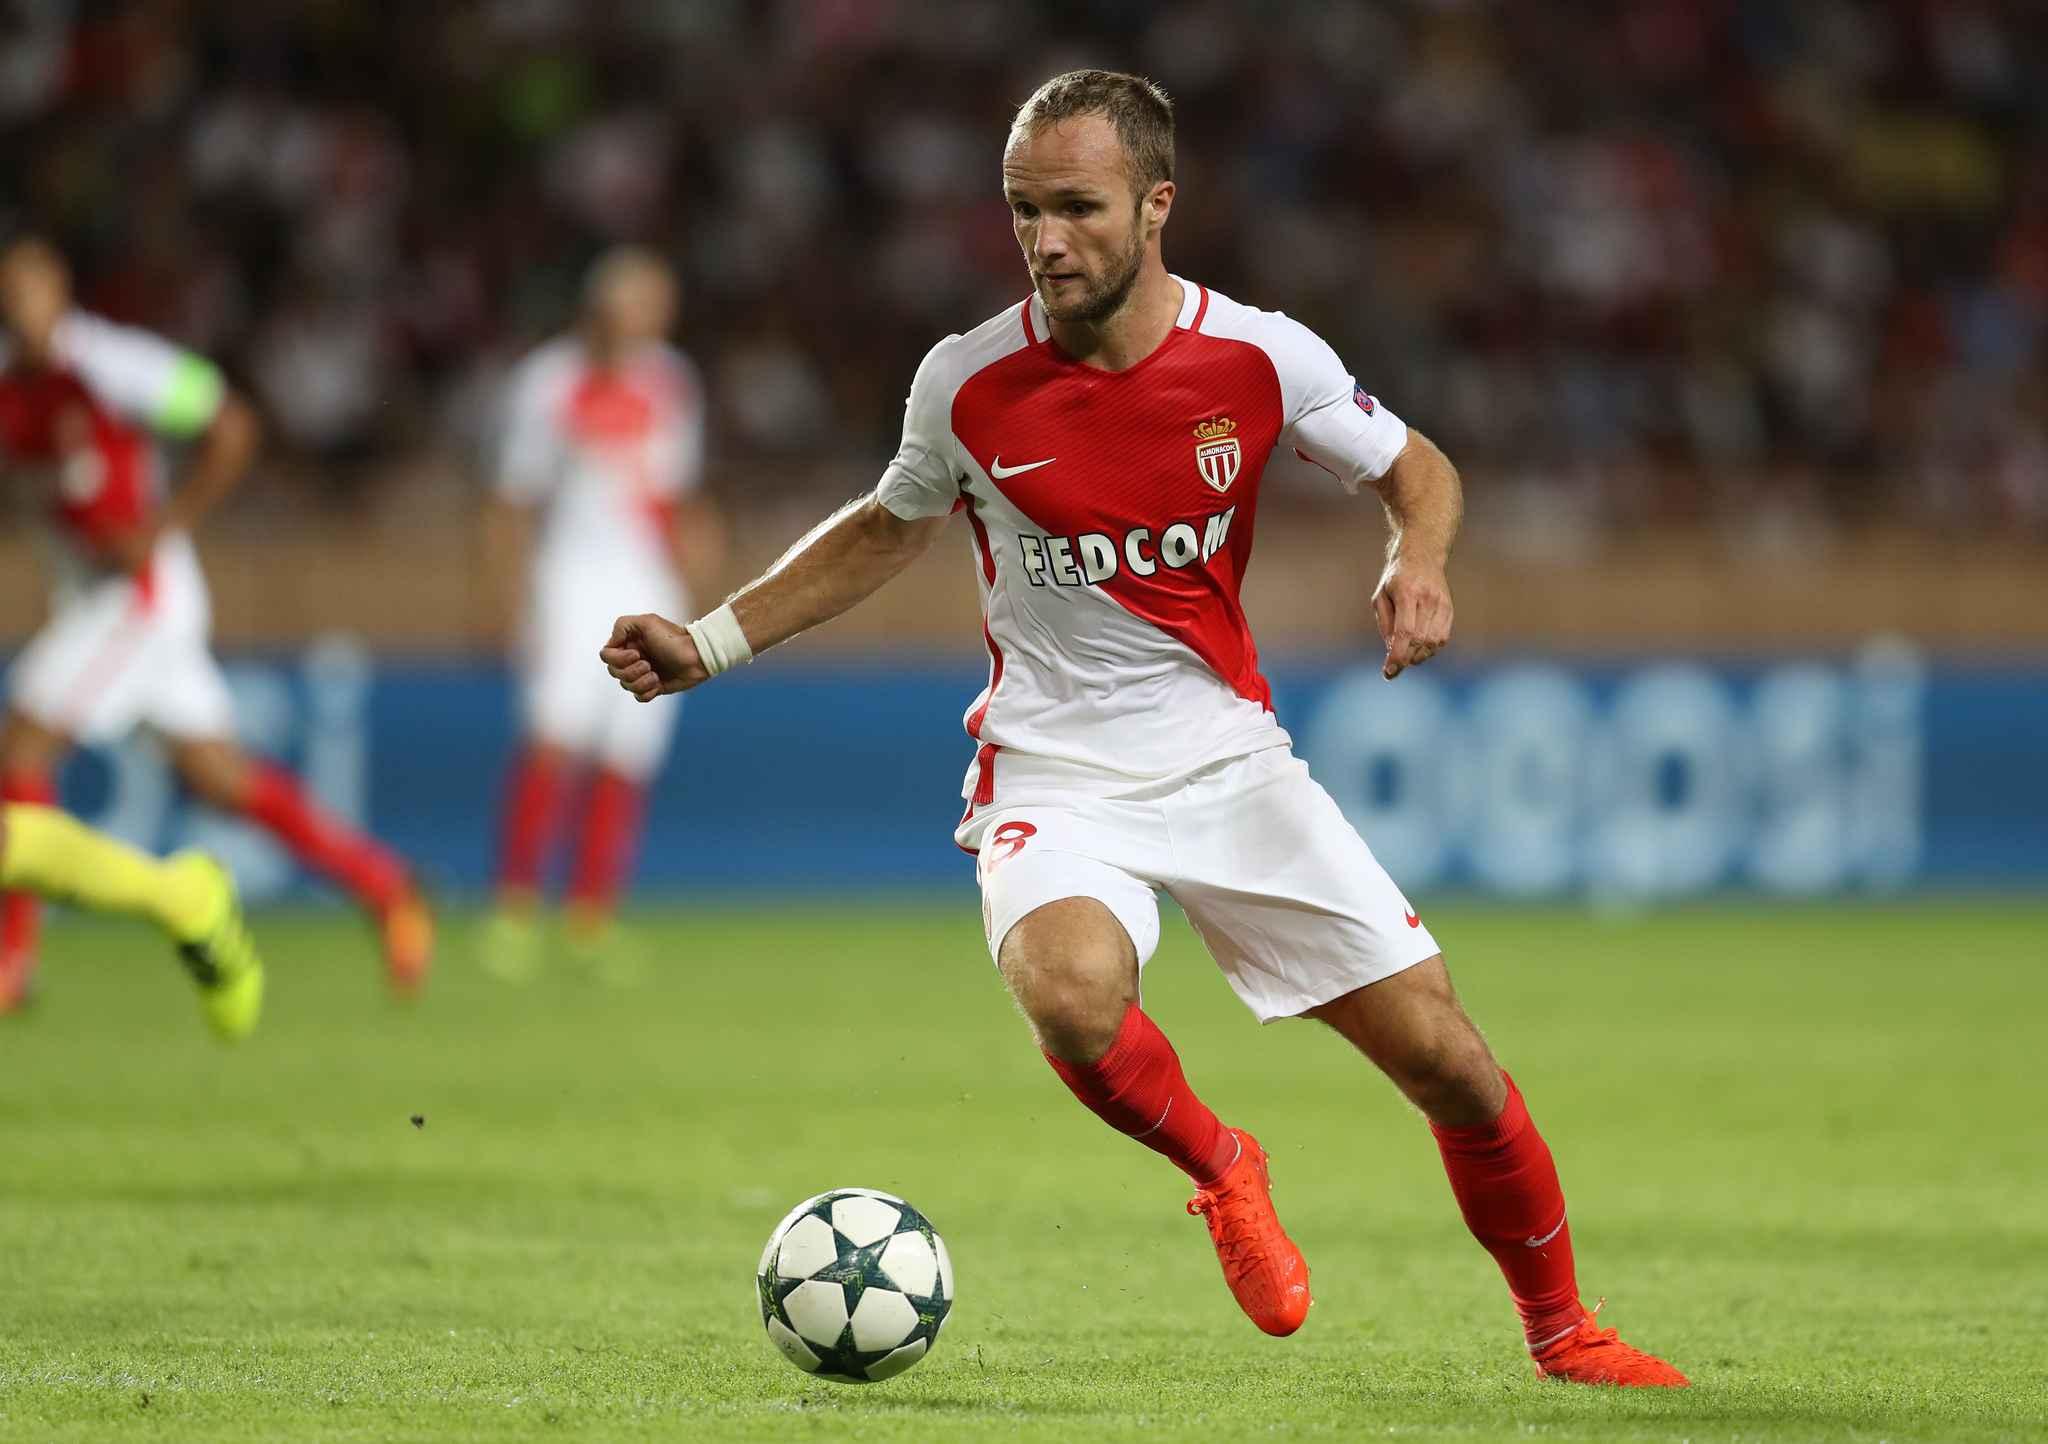 Germain Monaco